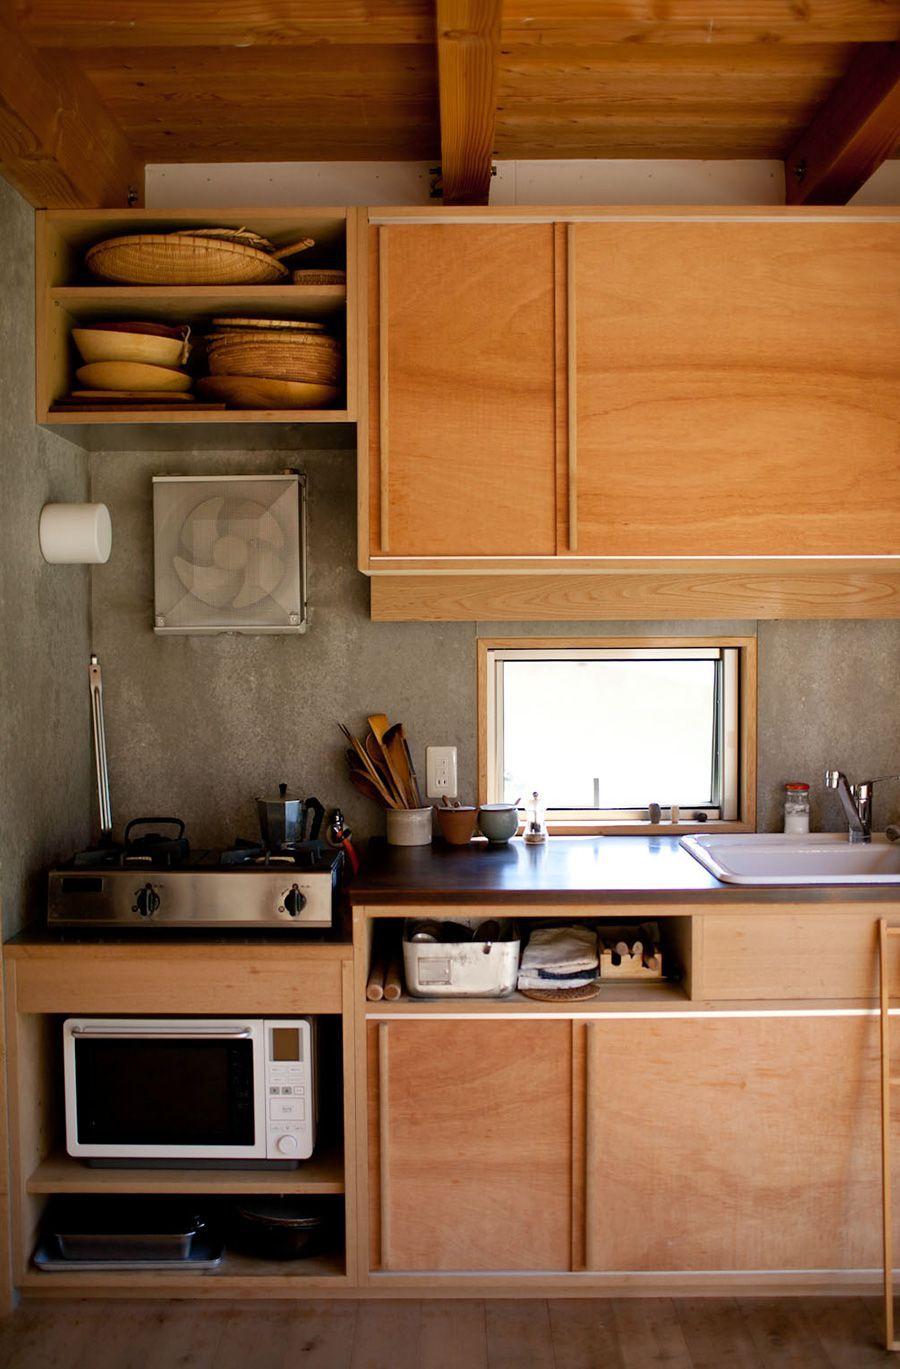 Japanese Kitchen Cabinet Google Arama 2020 Mutfak Dekor